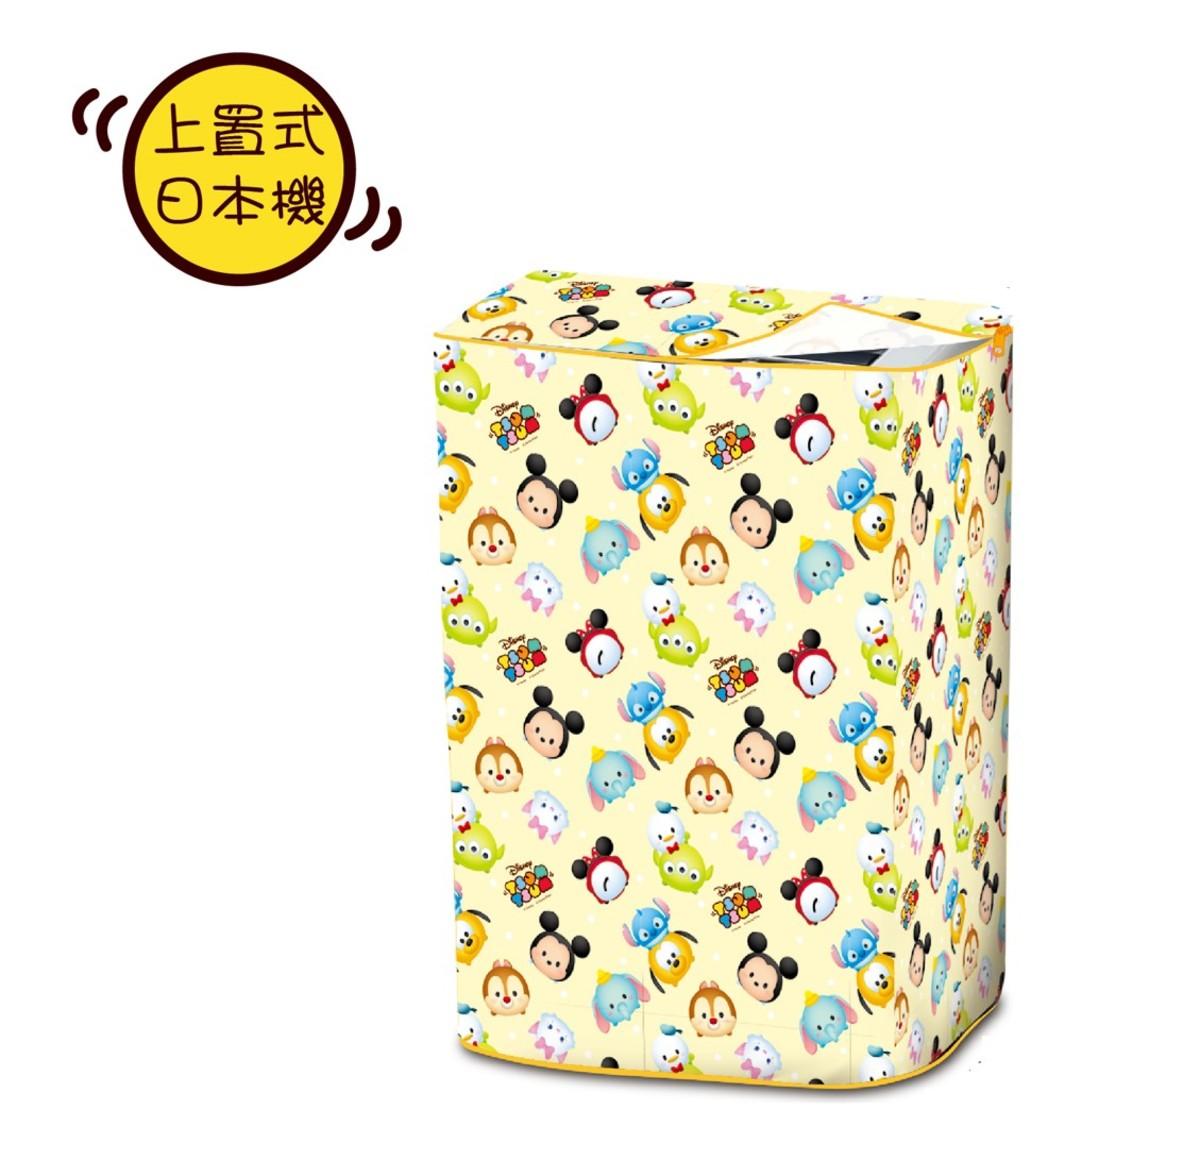 Tsum TsumDisney- Washing Machine Cover (JAPAN) (Licensed by Disney)